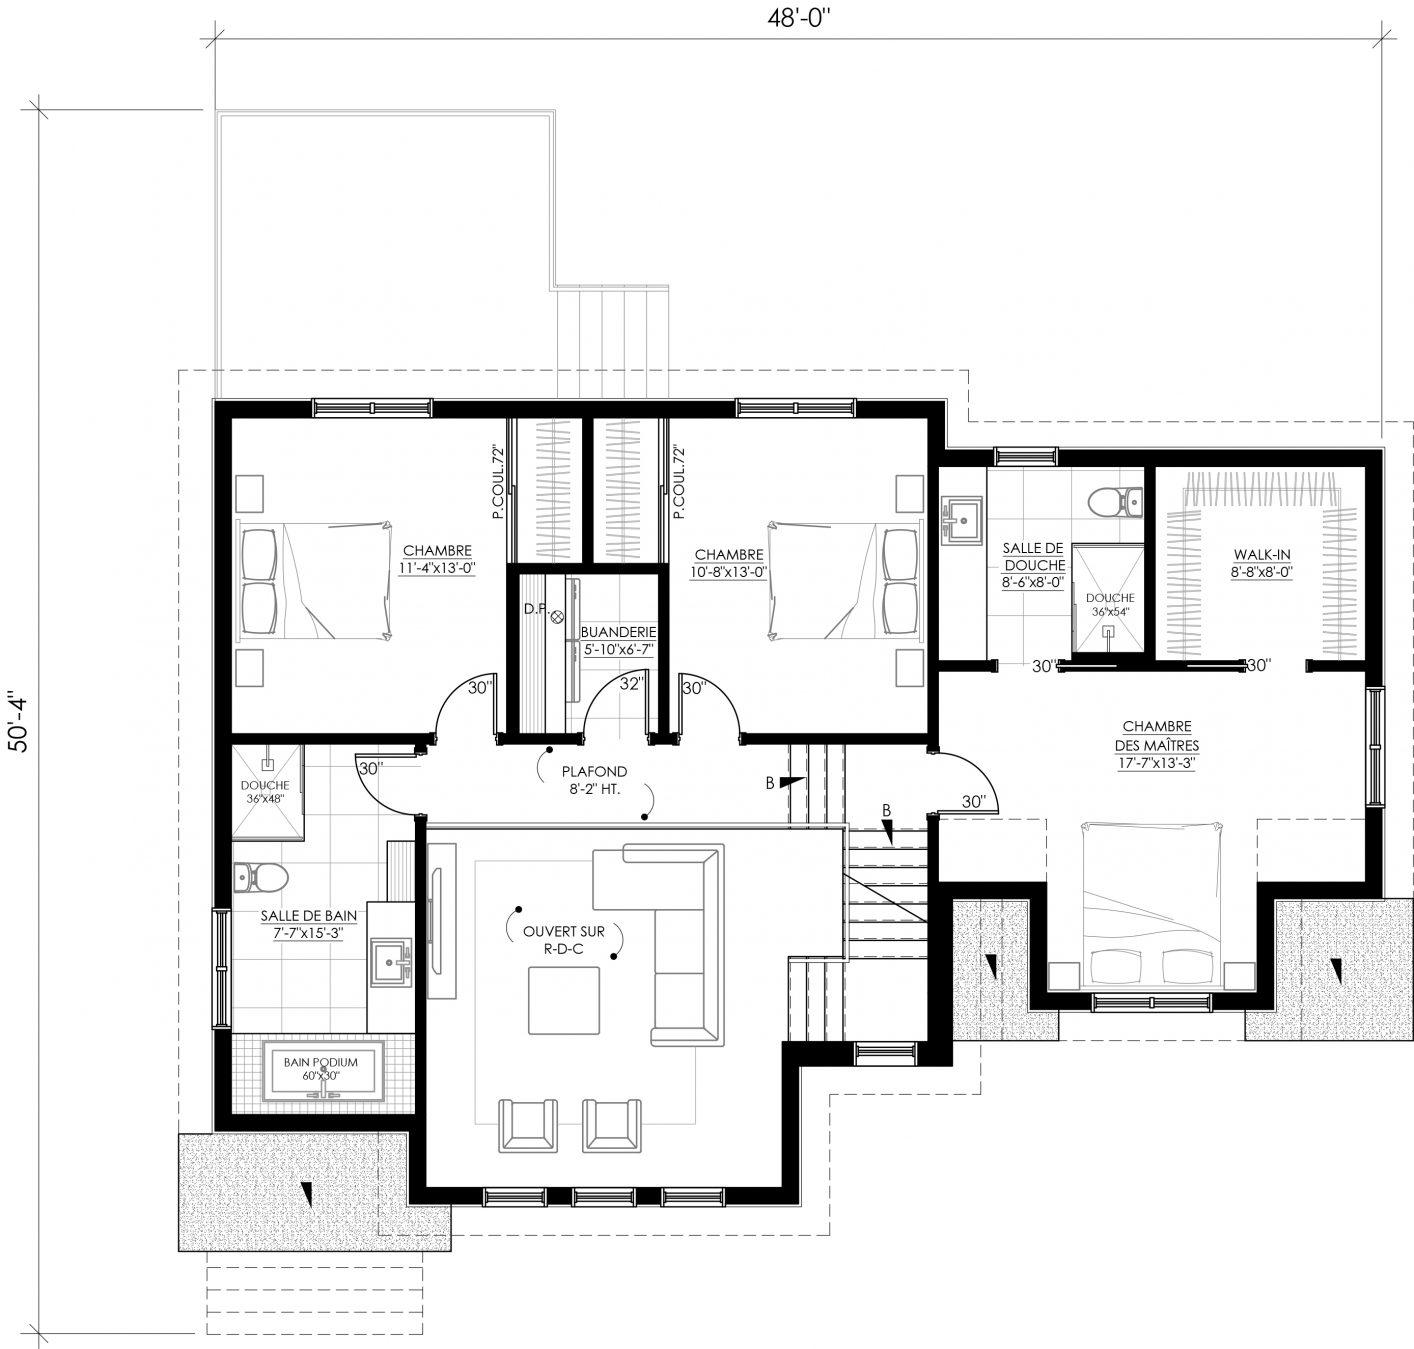 Plan étage inversé